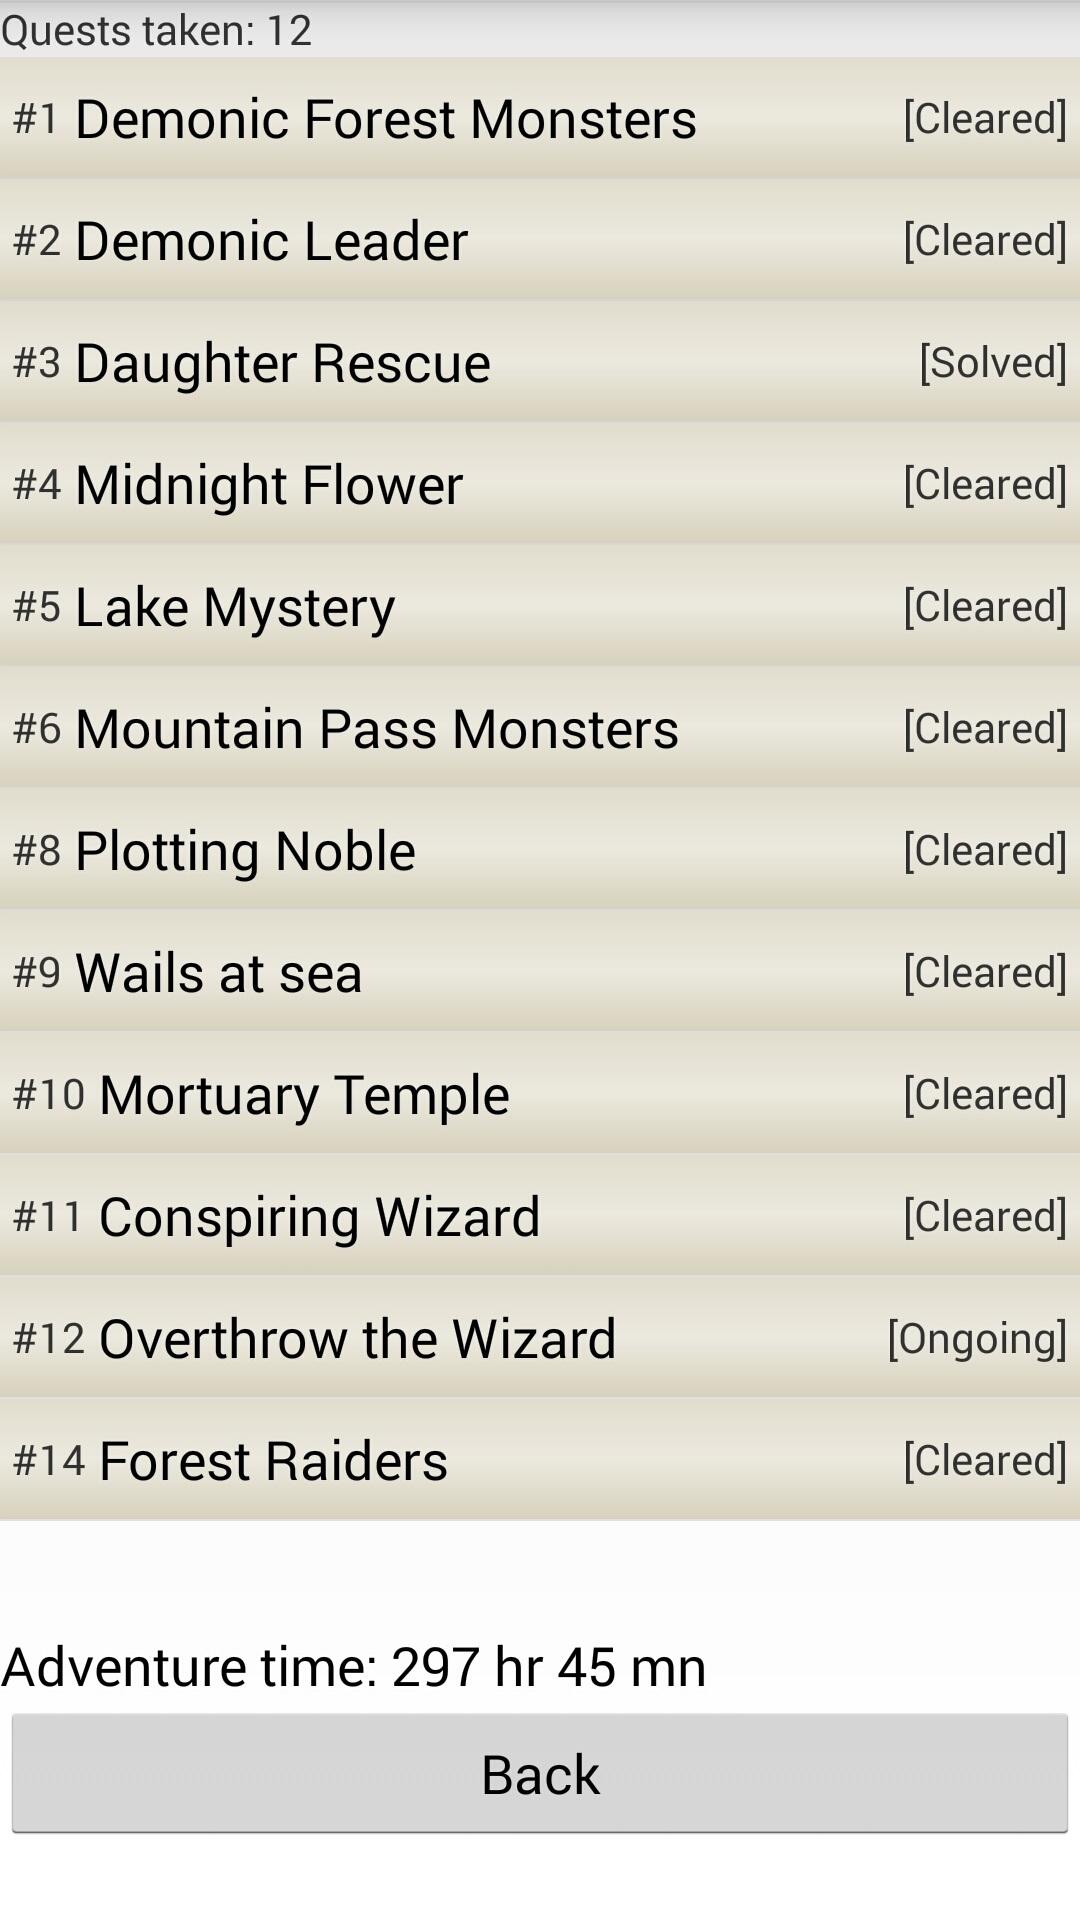 Quest | Logging Quest 2 Wiki | FANDOM powered by Wikia